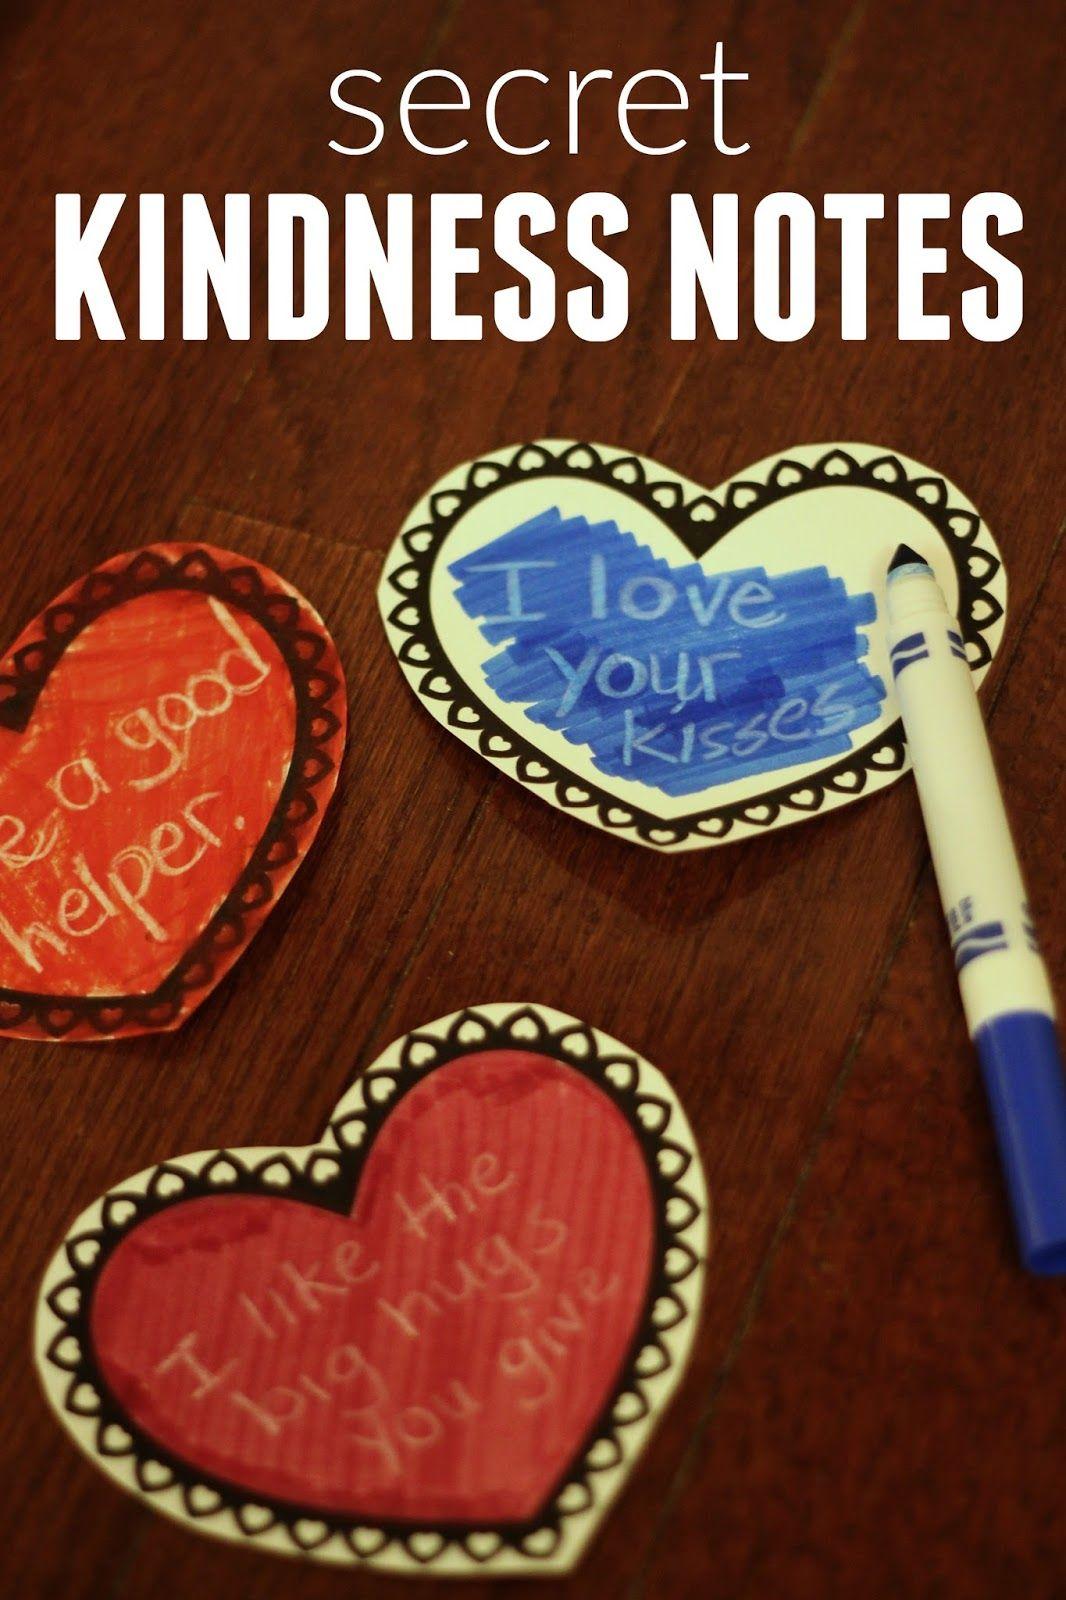 Secret Kindness Notes Kindness notes, Kindness